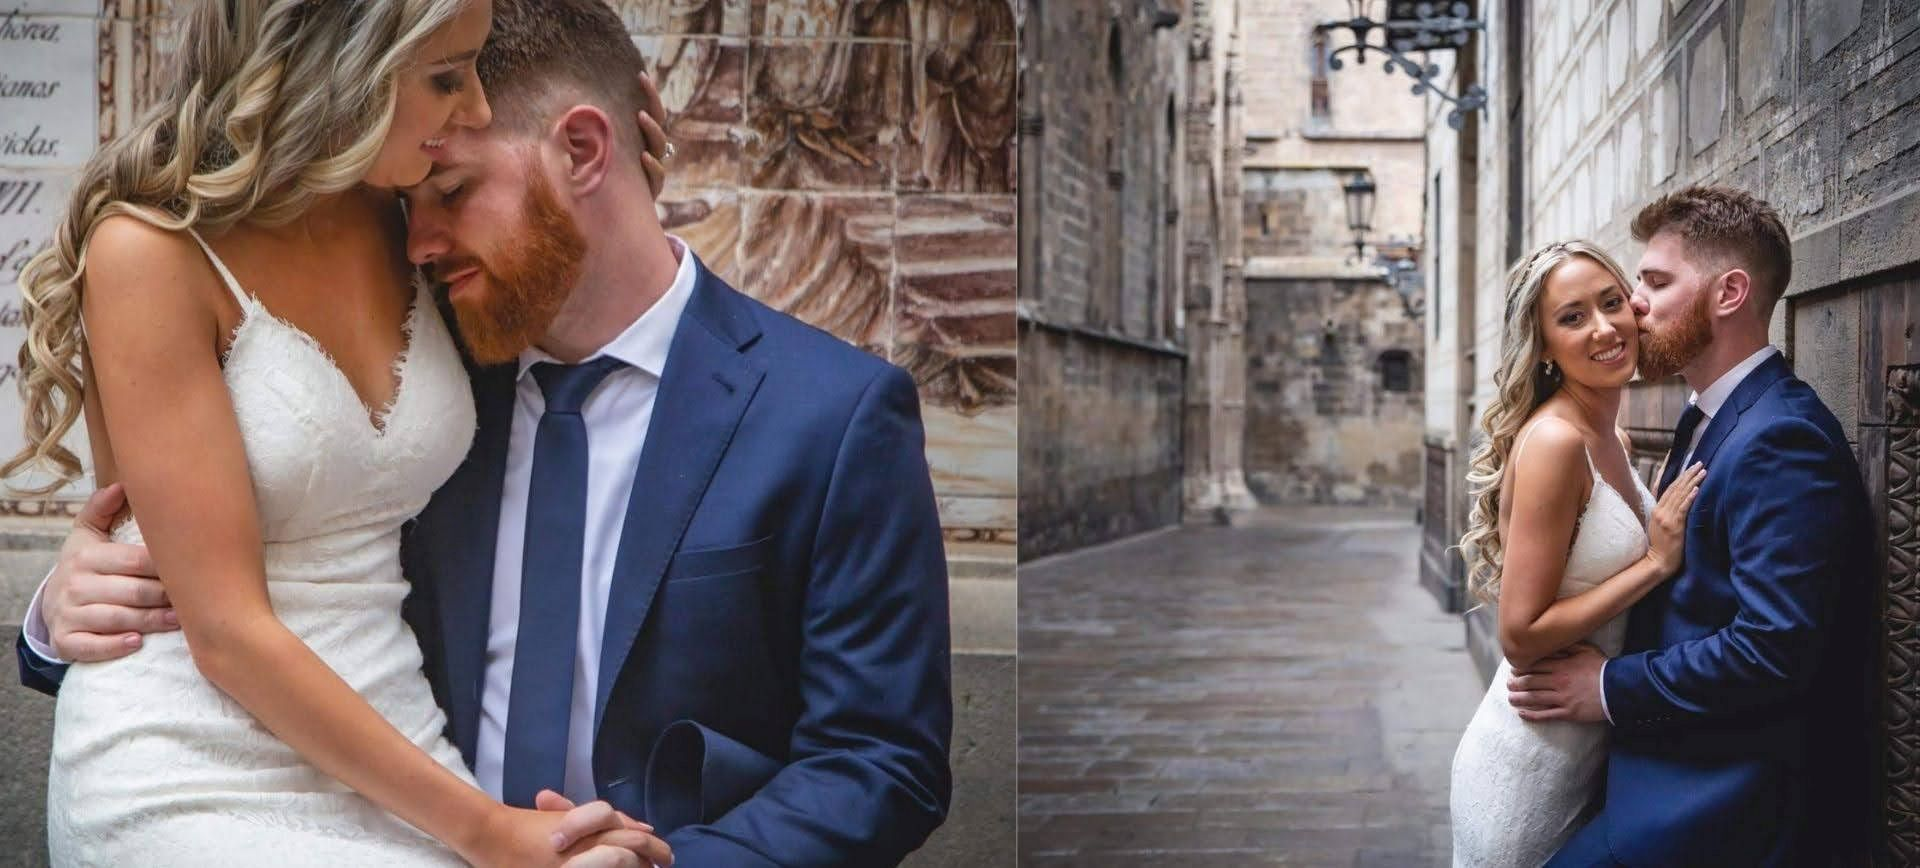 Barcelona wedding day at Gothic quarter